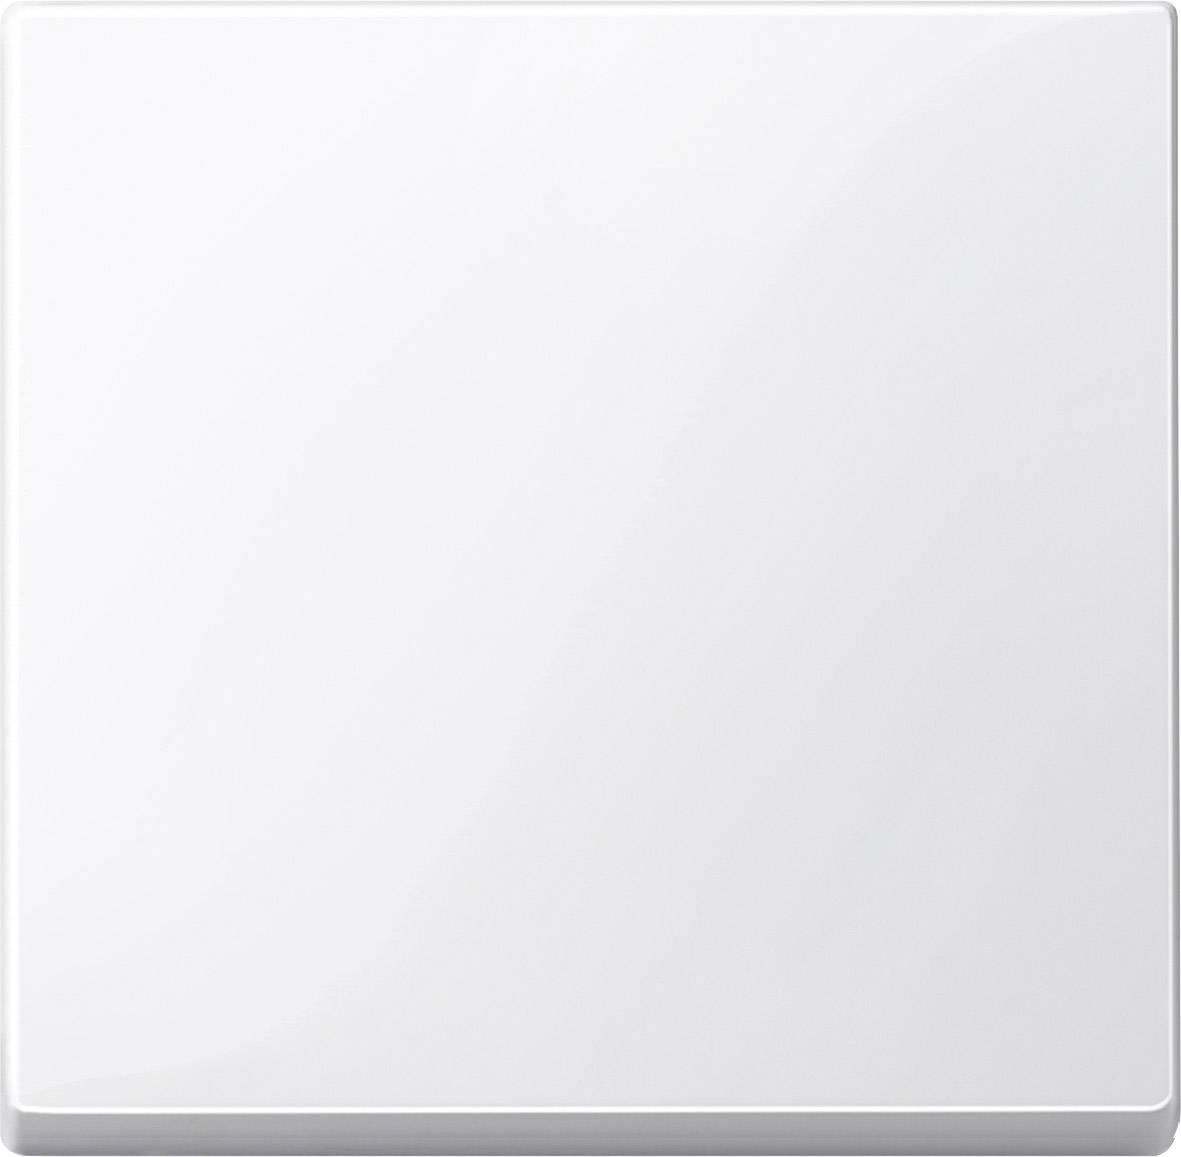 Kryt kolébkového vypínače Merten, polární bílá (432119)